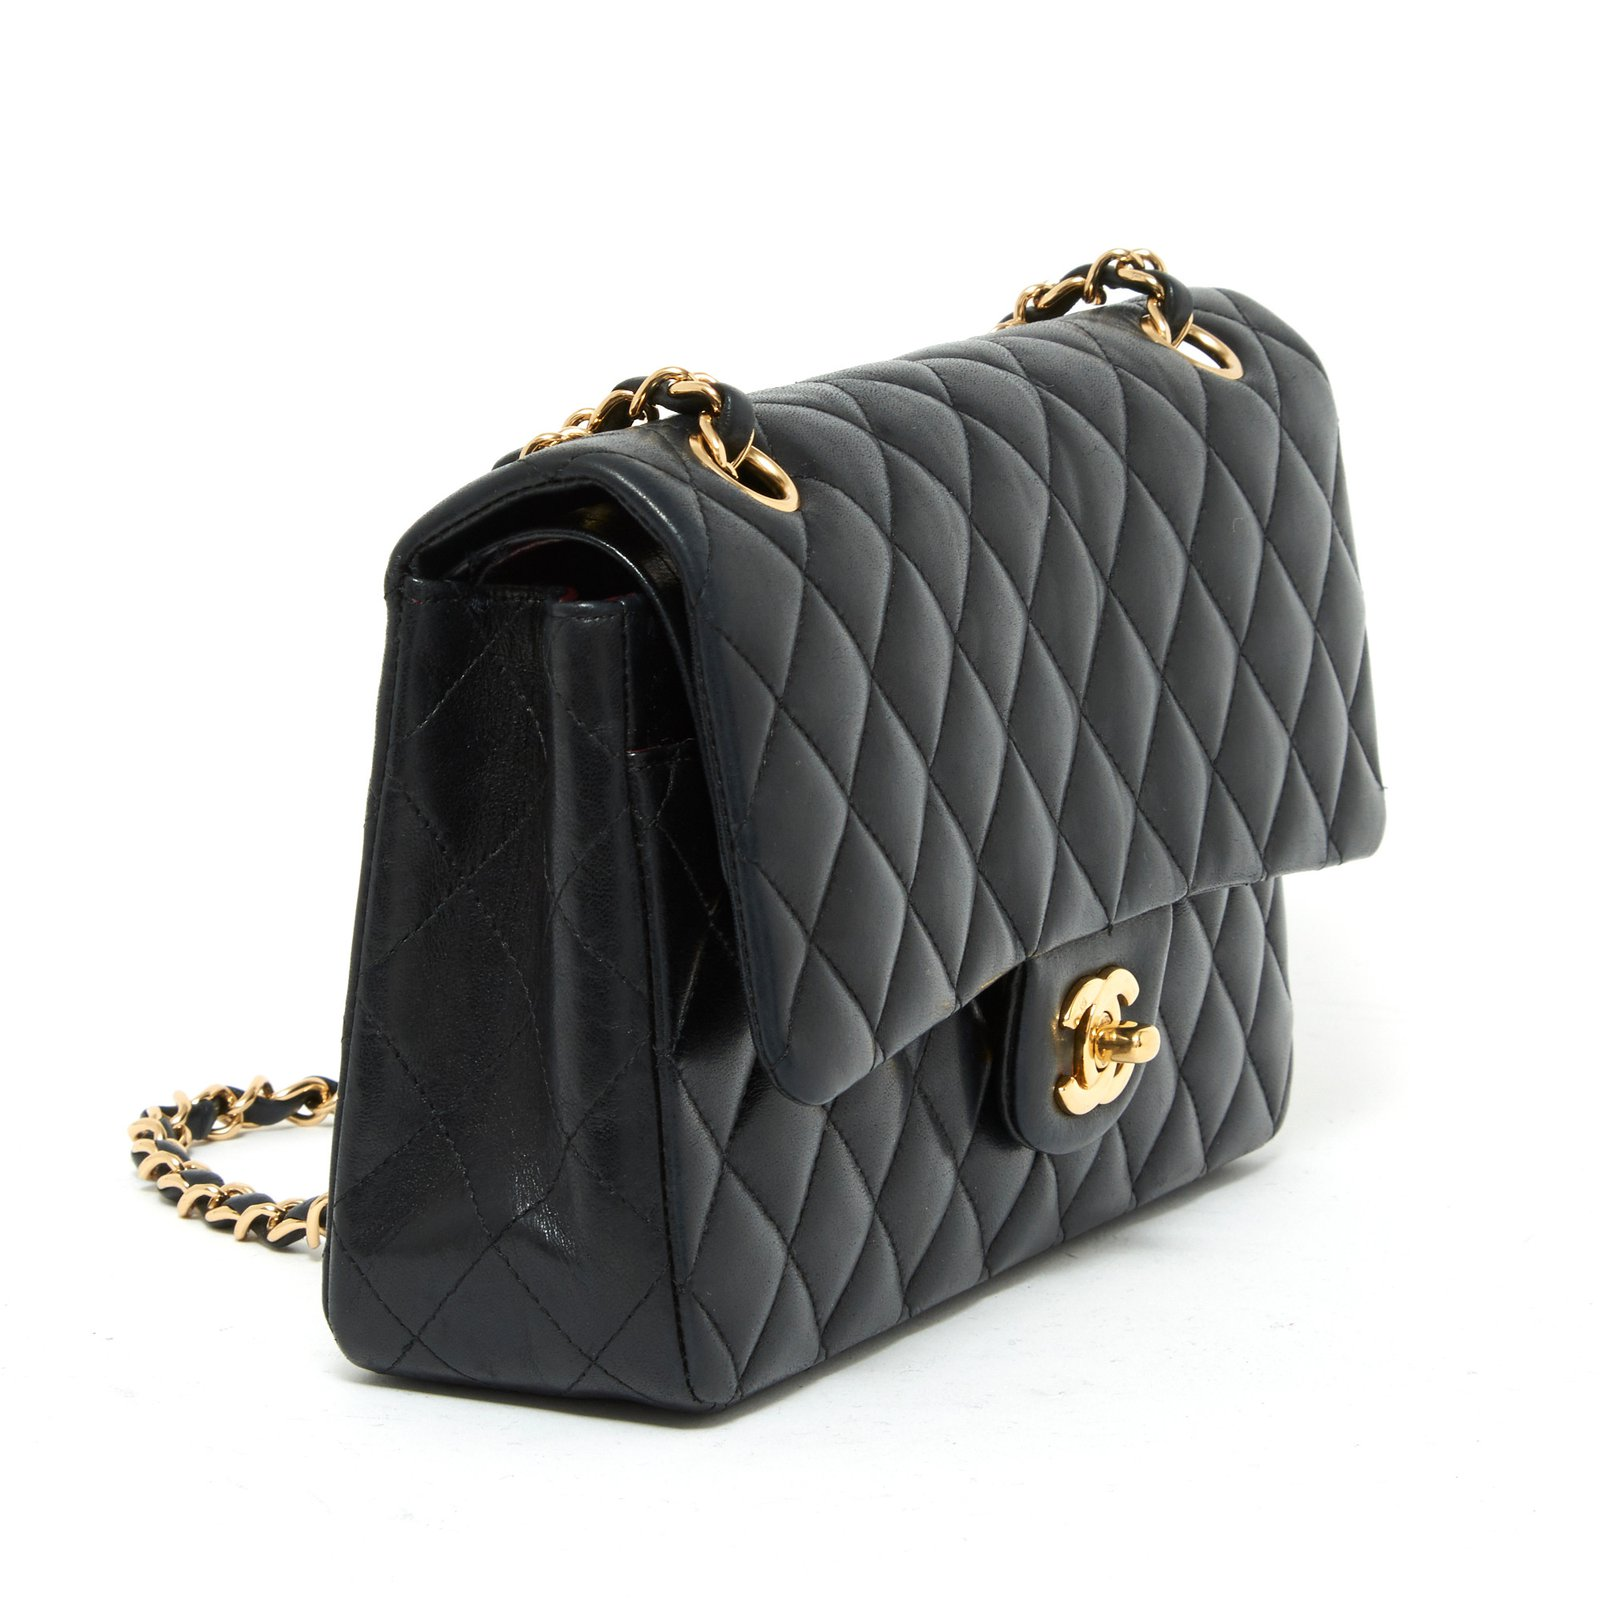 e8b880700b0c Chanel CHANEL TIMELESS CLASSIC 25 BLACK Handbags Leather Black ref.91263 -  Joli Closet